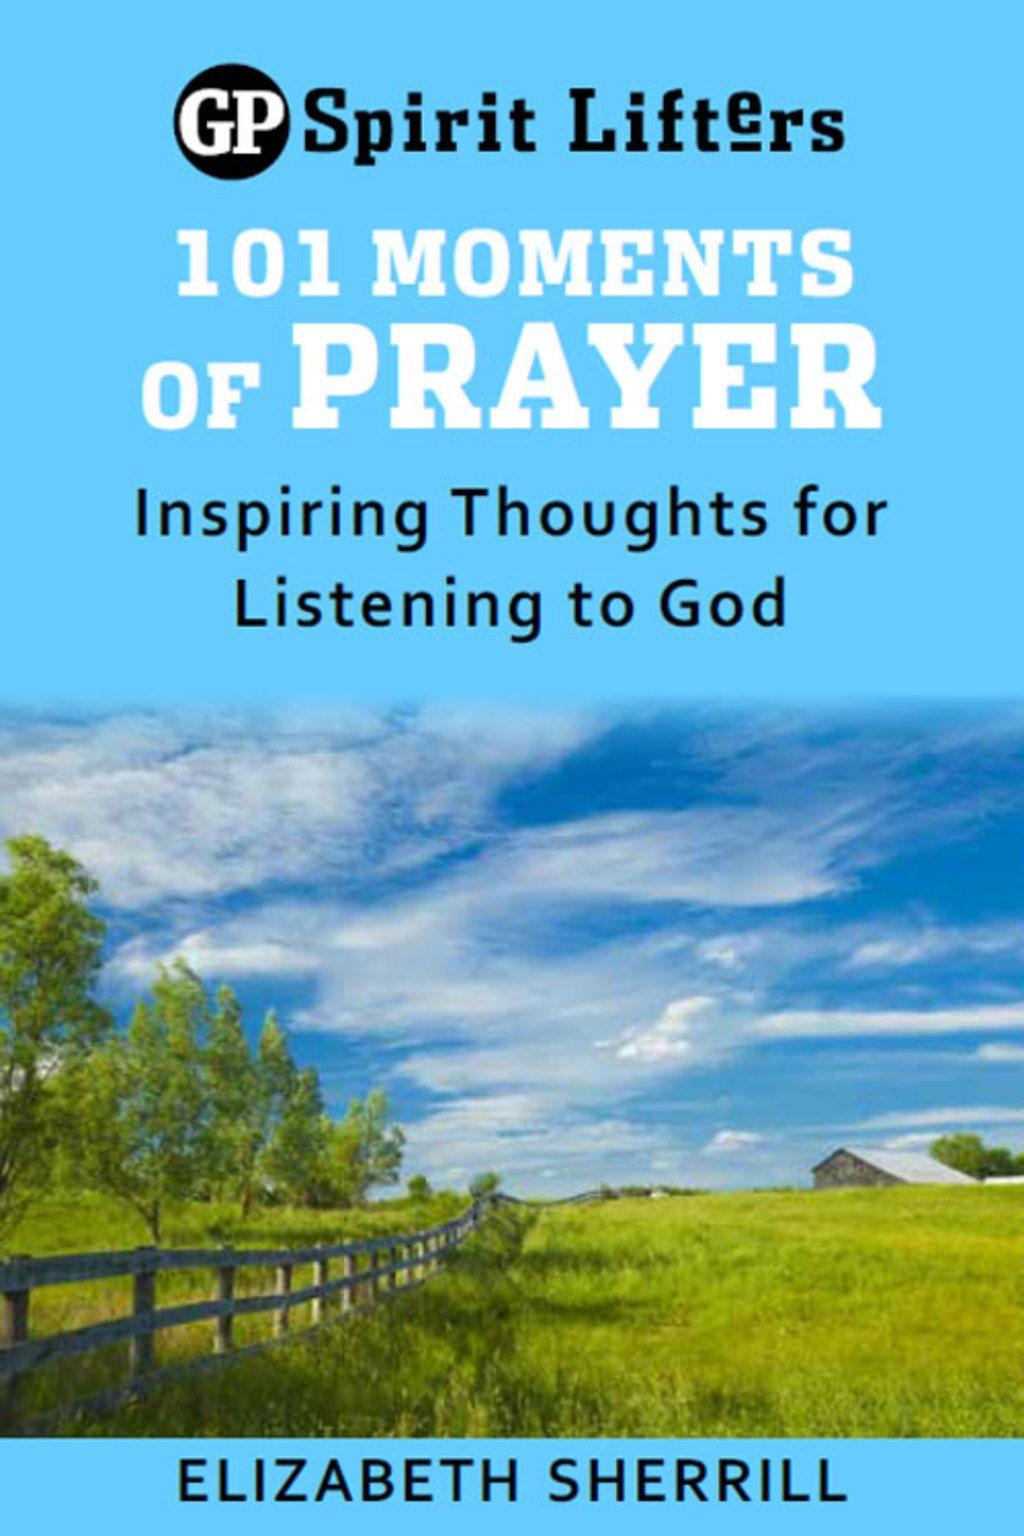 101 Moments of Prayer (eBook)